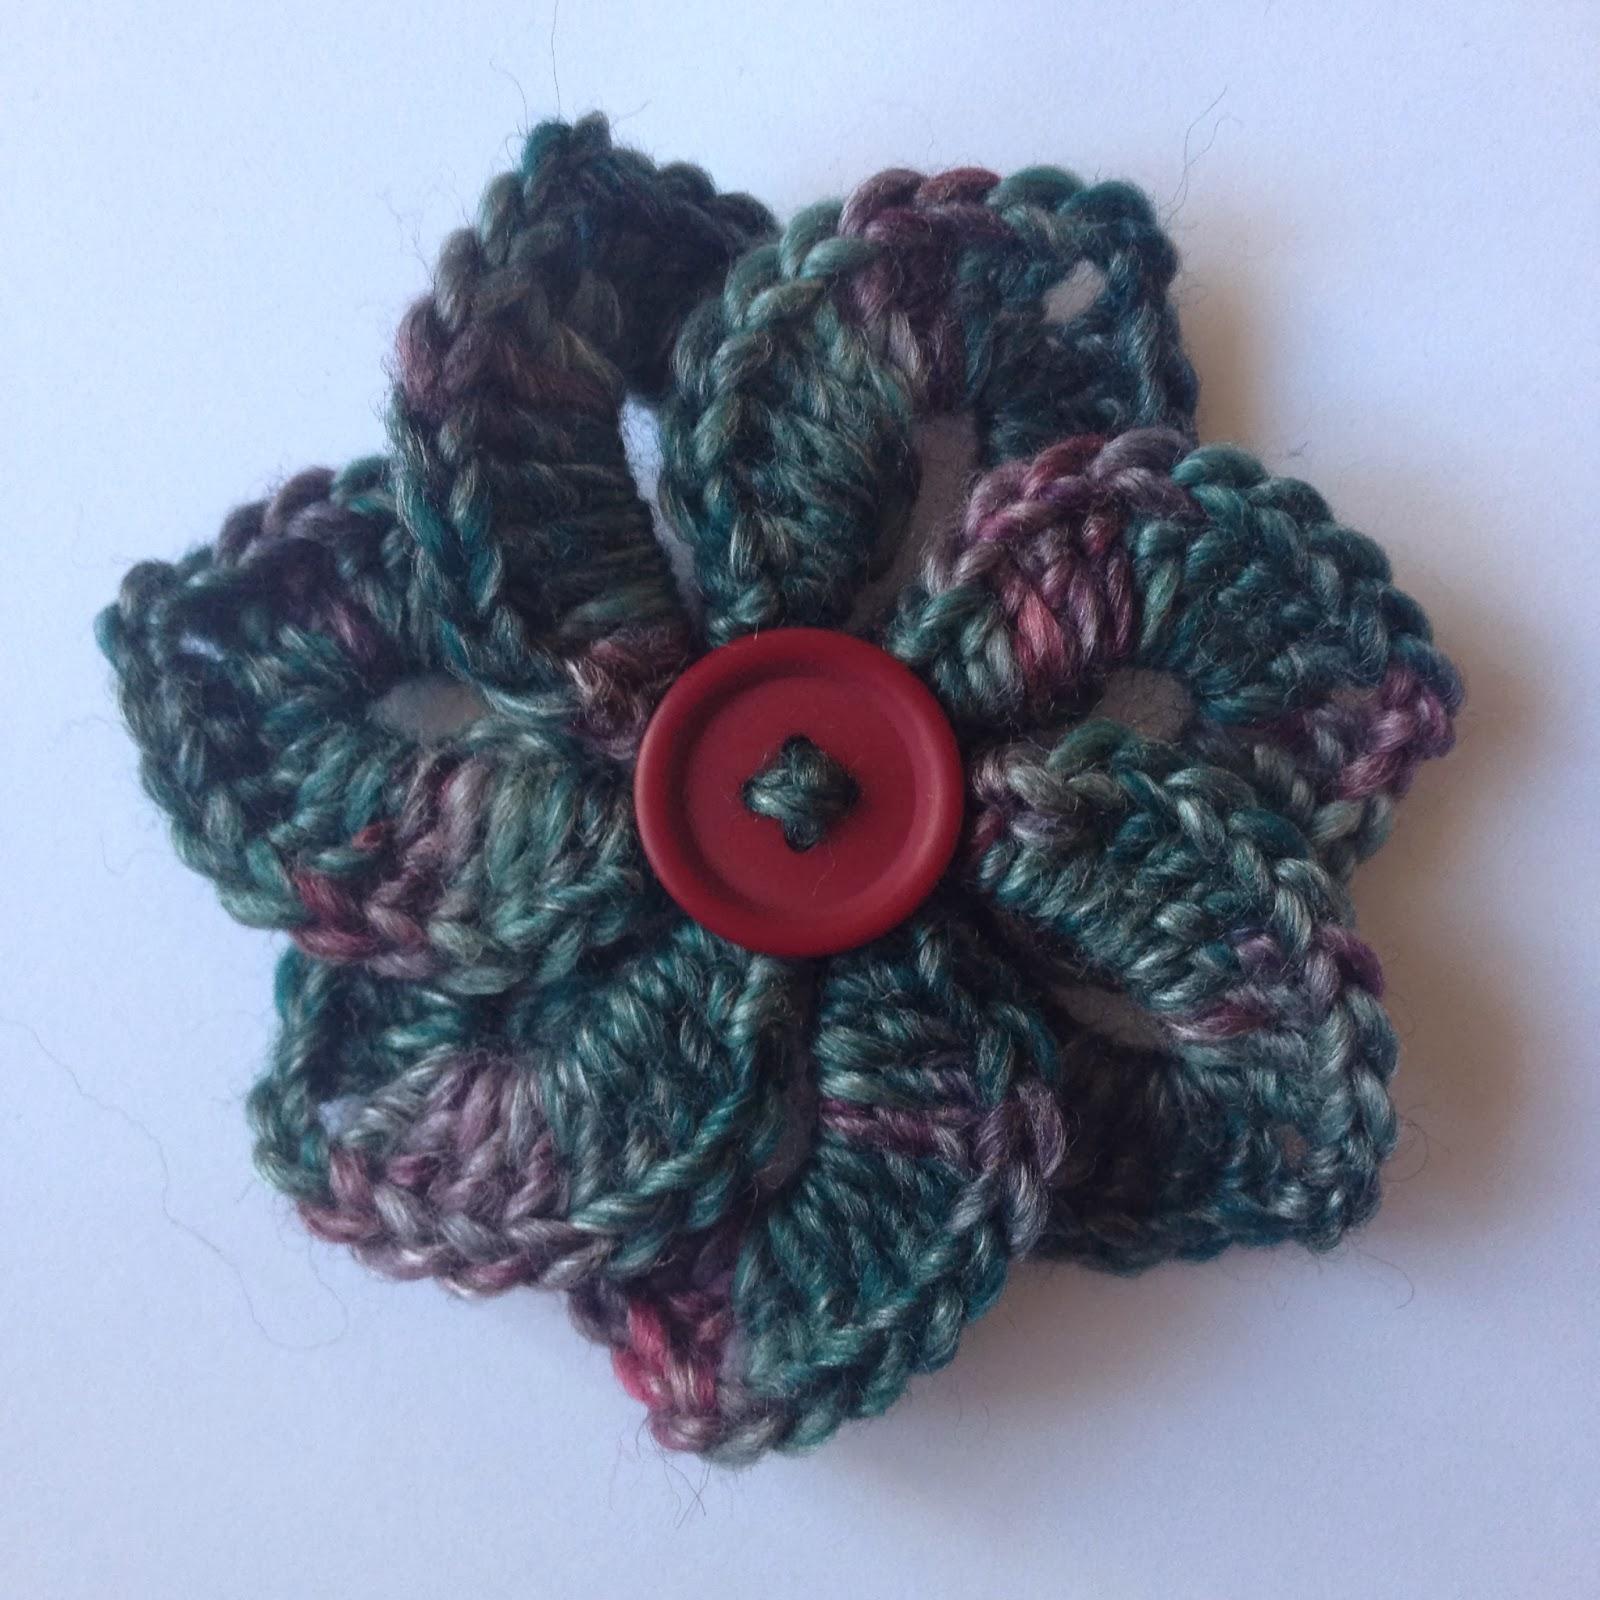 365 Granny Squares Project: A crocodile stitch flower......